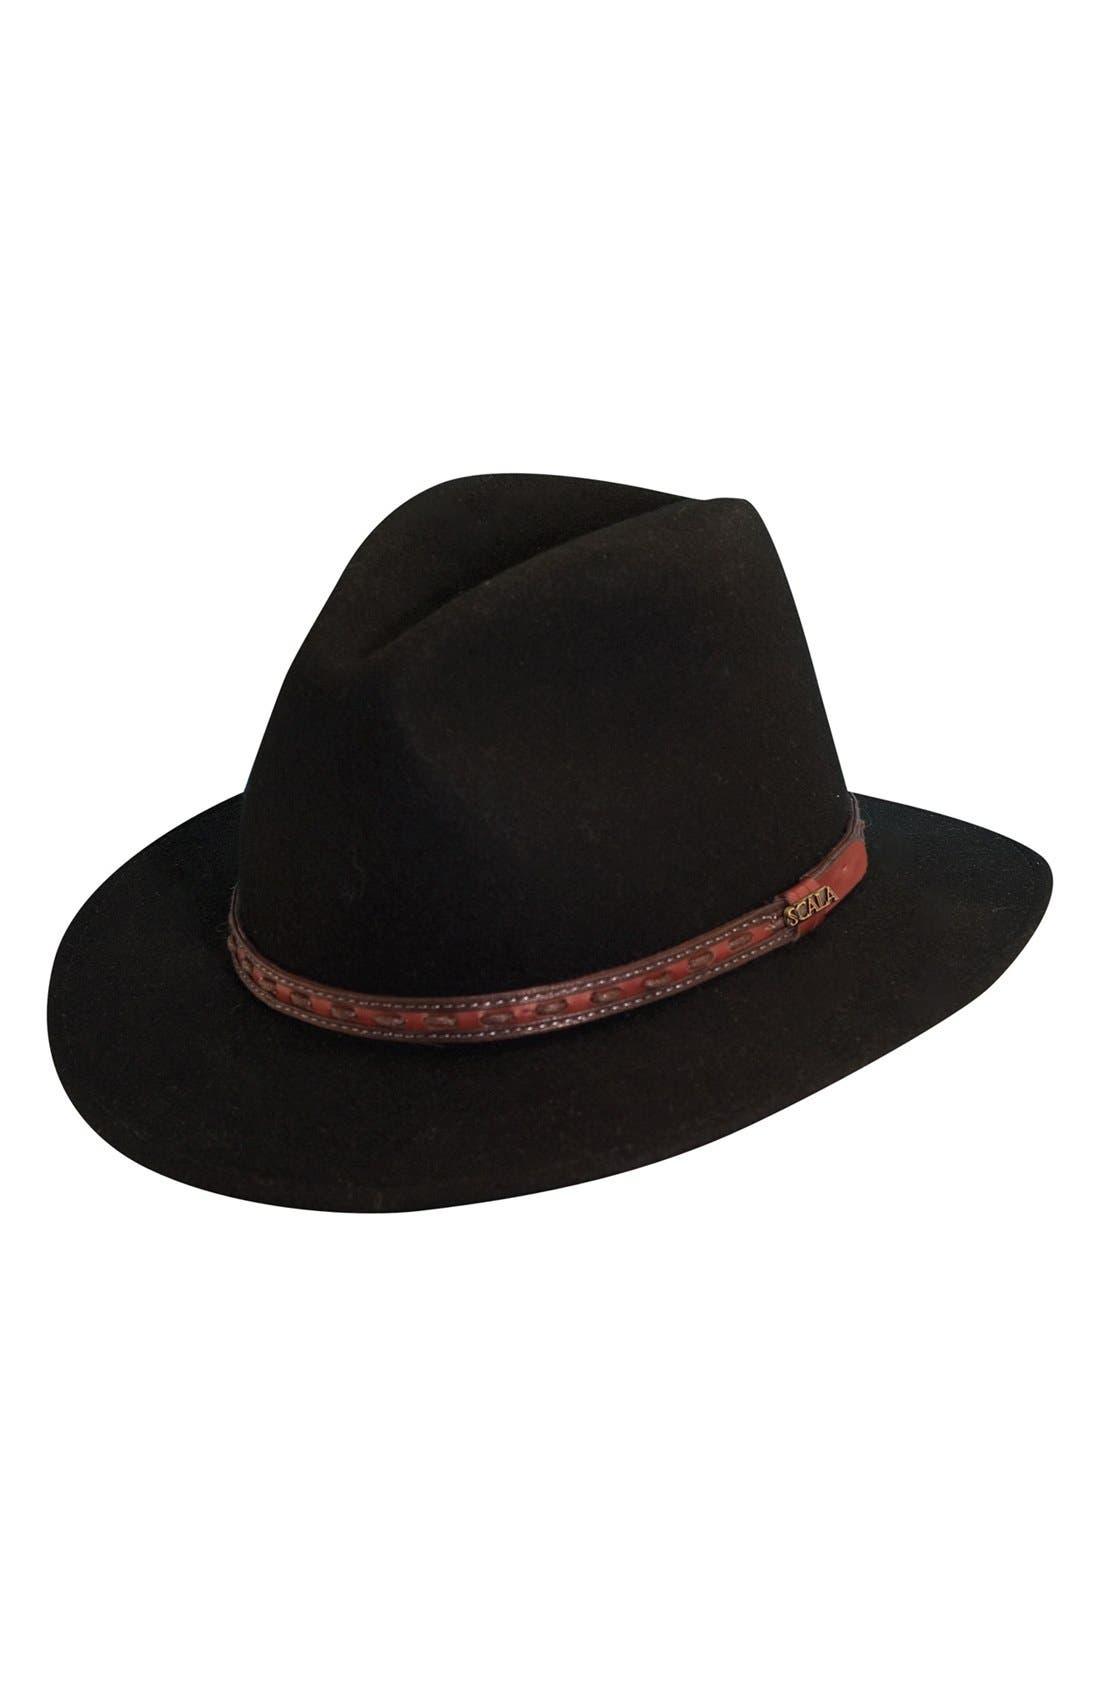 'Classico' Crushable Felt Safari Hat,                         Main,                         color, Black